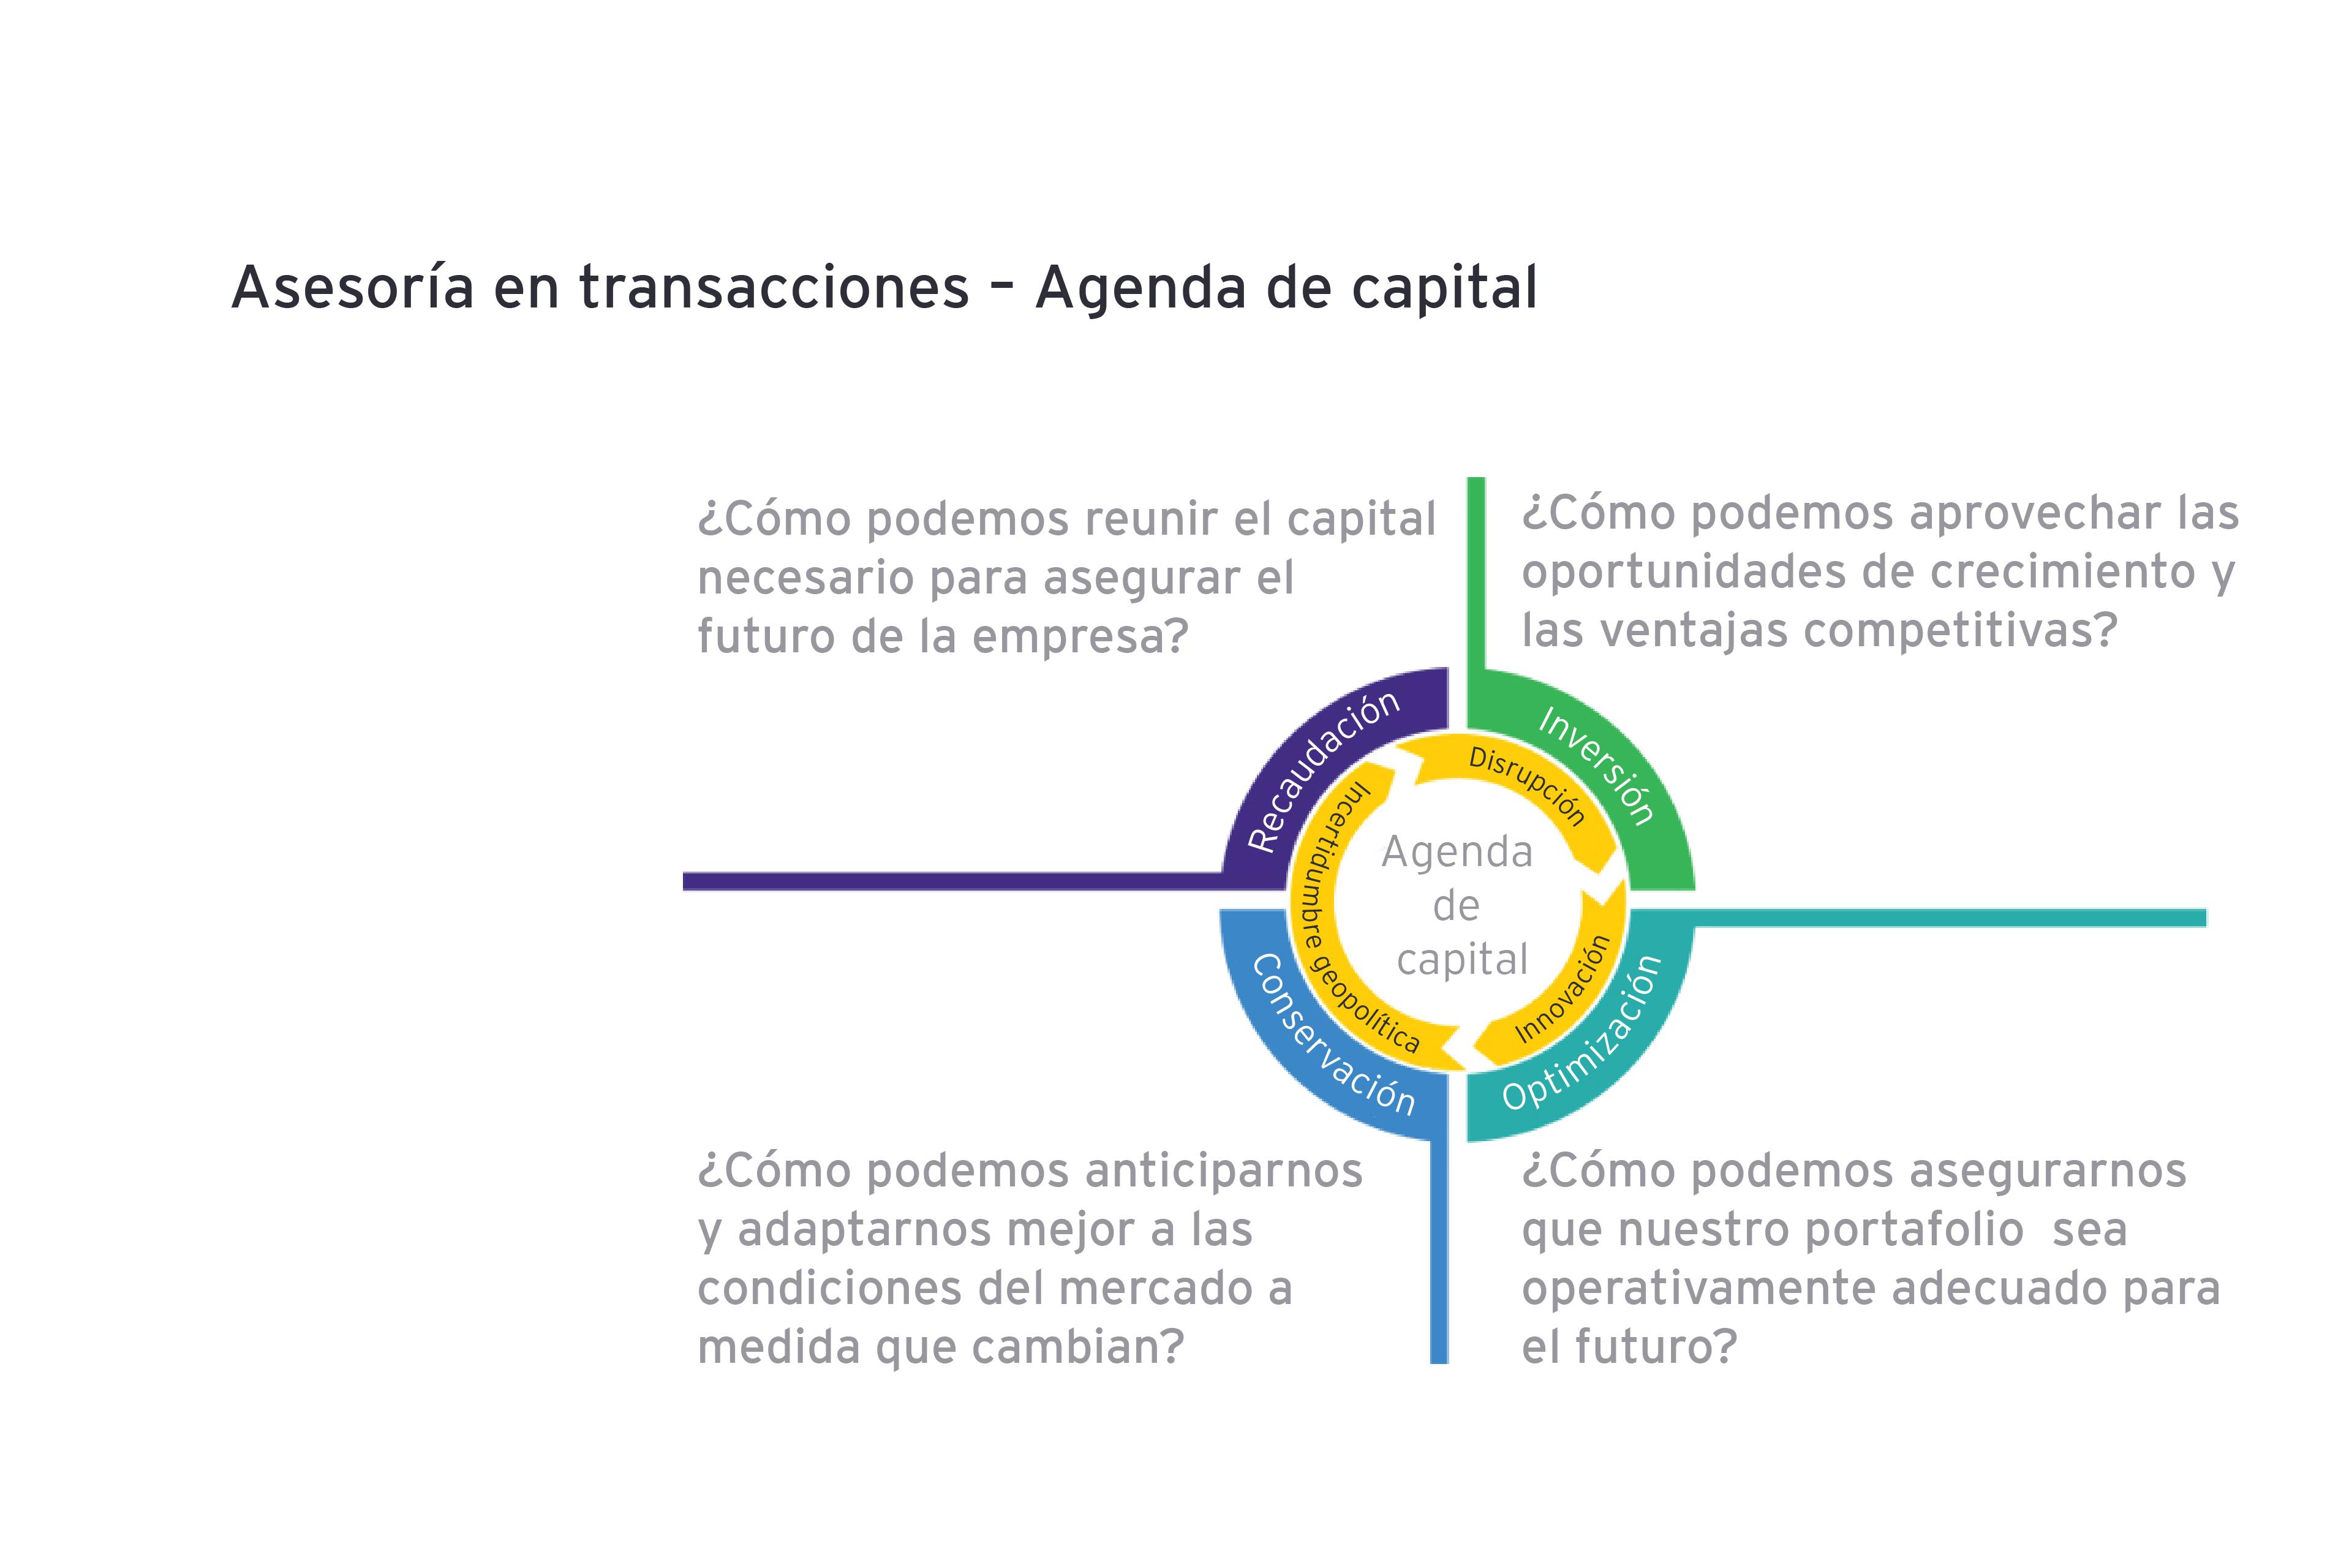 Agenda de capital